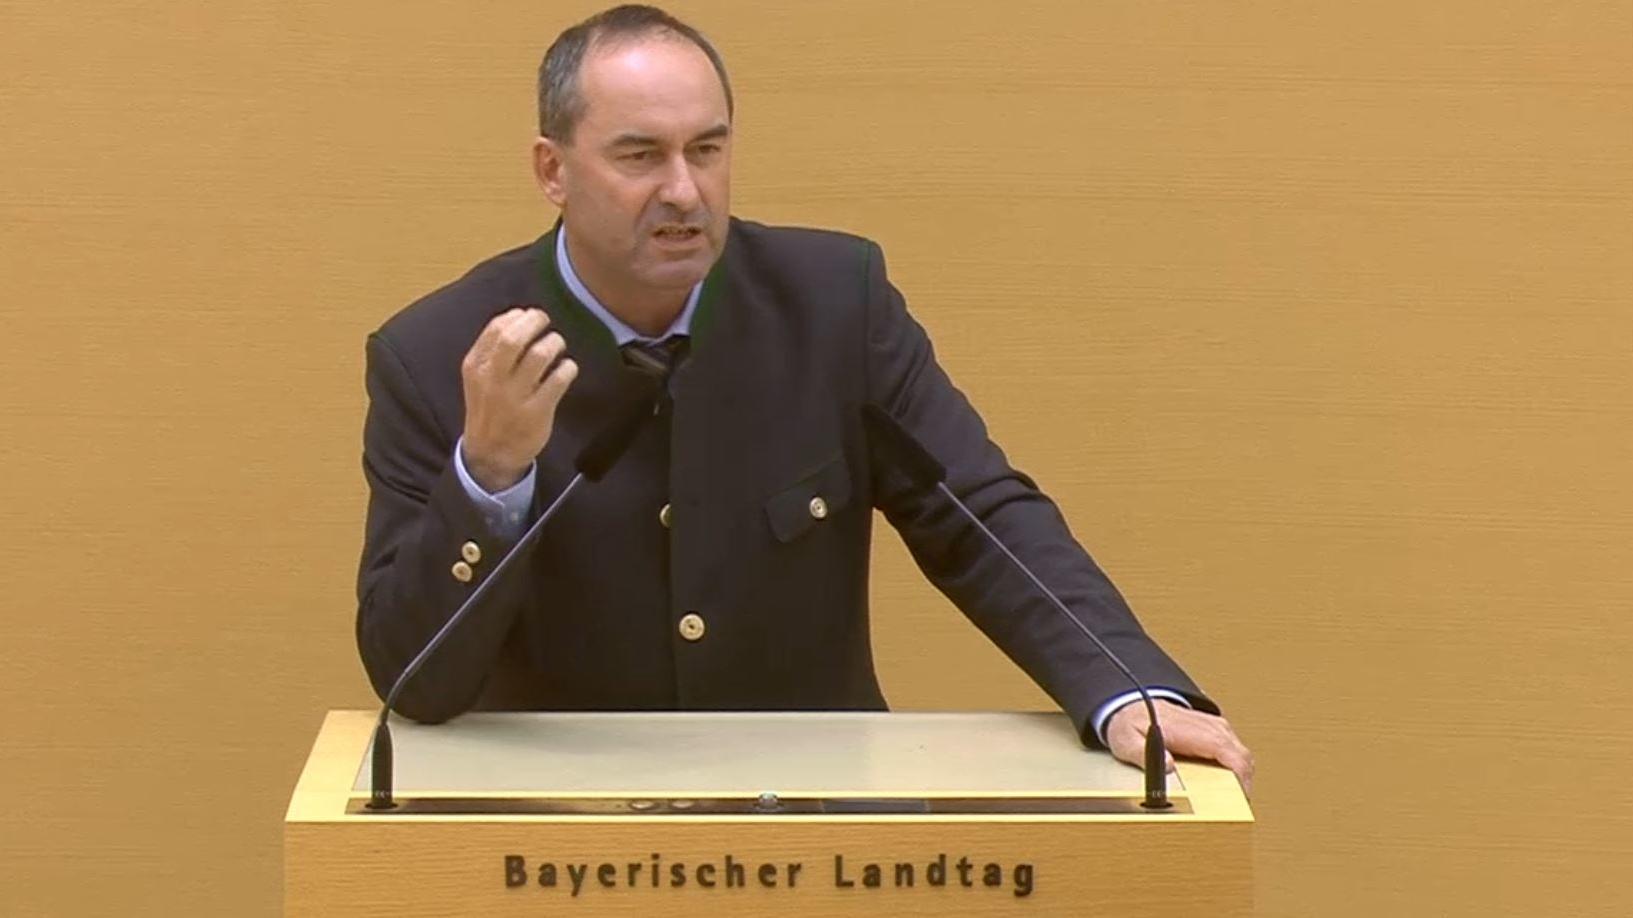 Freie-Wähler-Chef Aiwanger